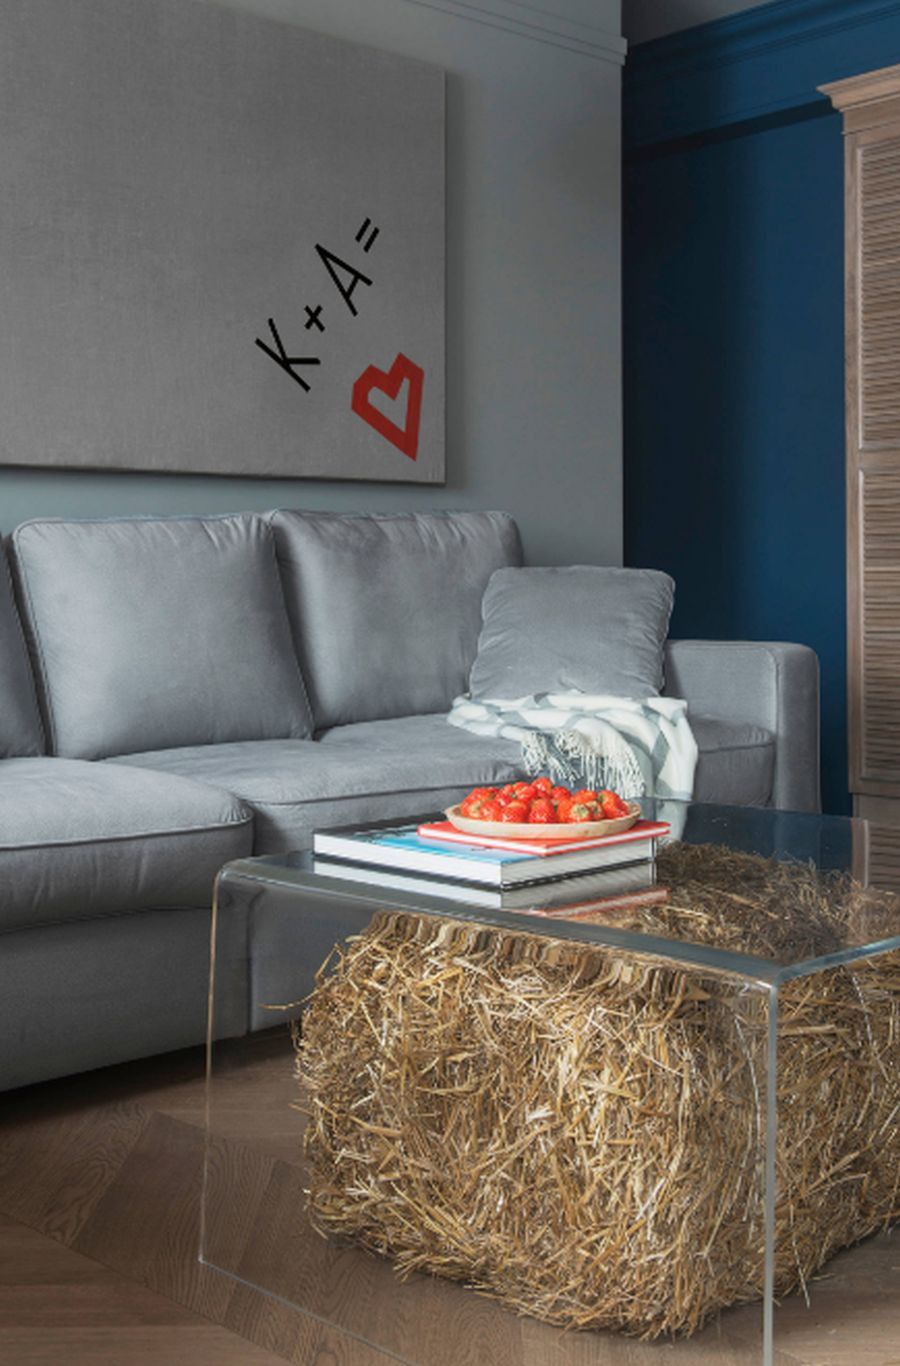 adelaparvu-com-despre-reoganizarea-unui-apartament-de-2-camere-in-3-camere-54-mp-designer-masha-kunyakina-foto-olga-melekesceva-9